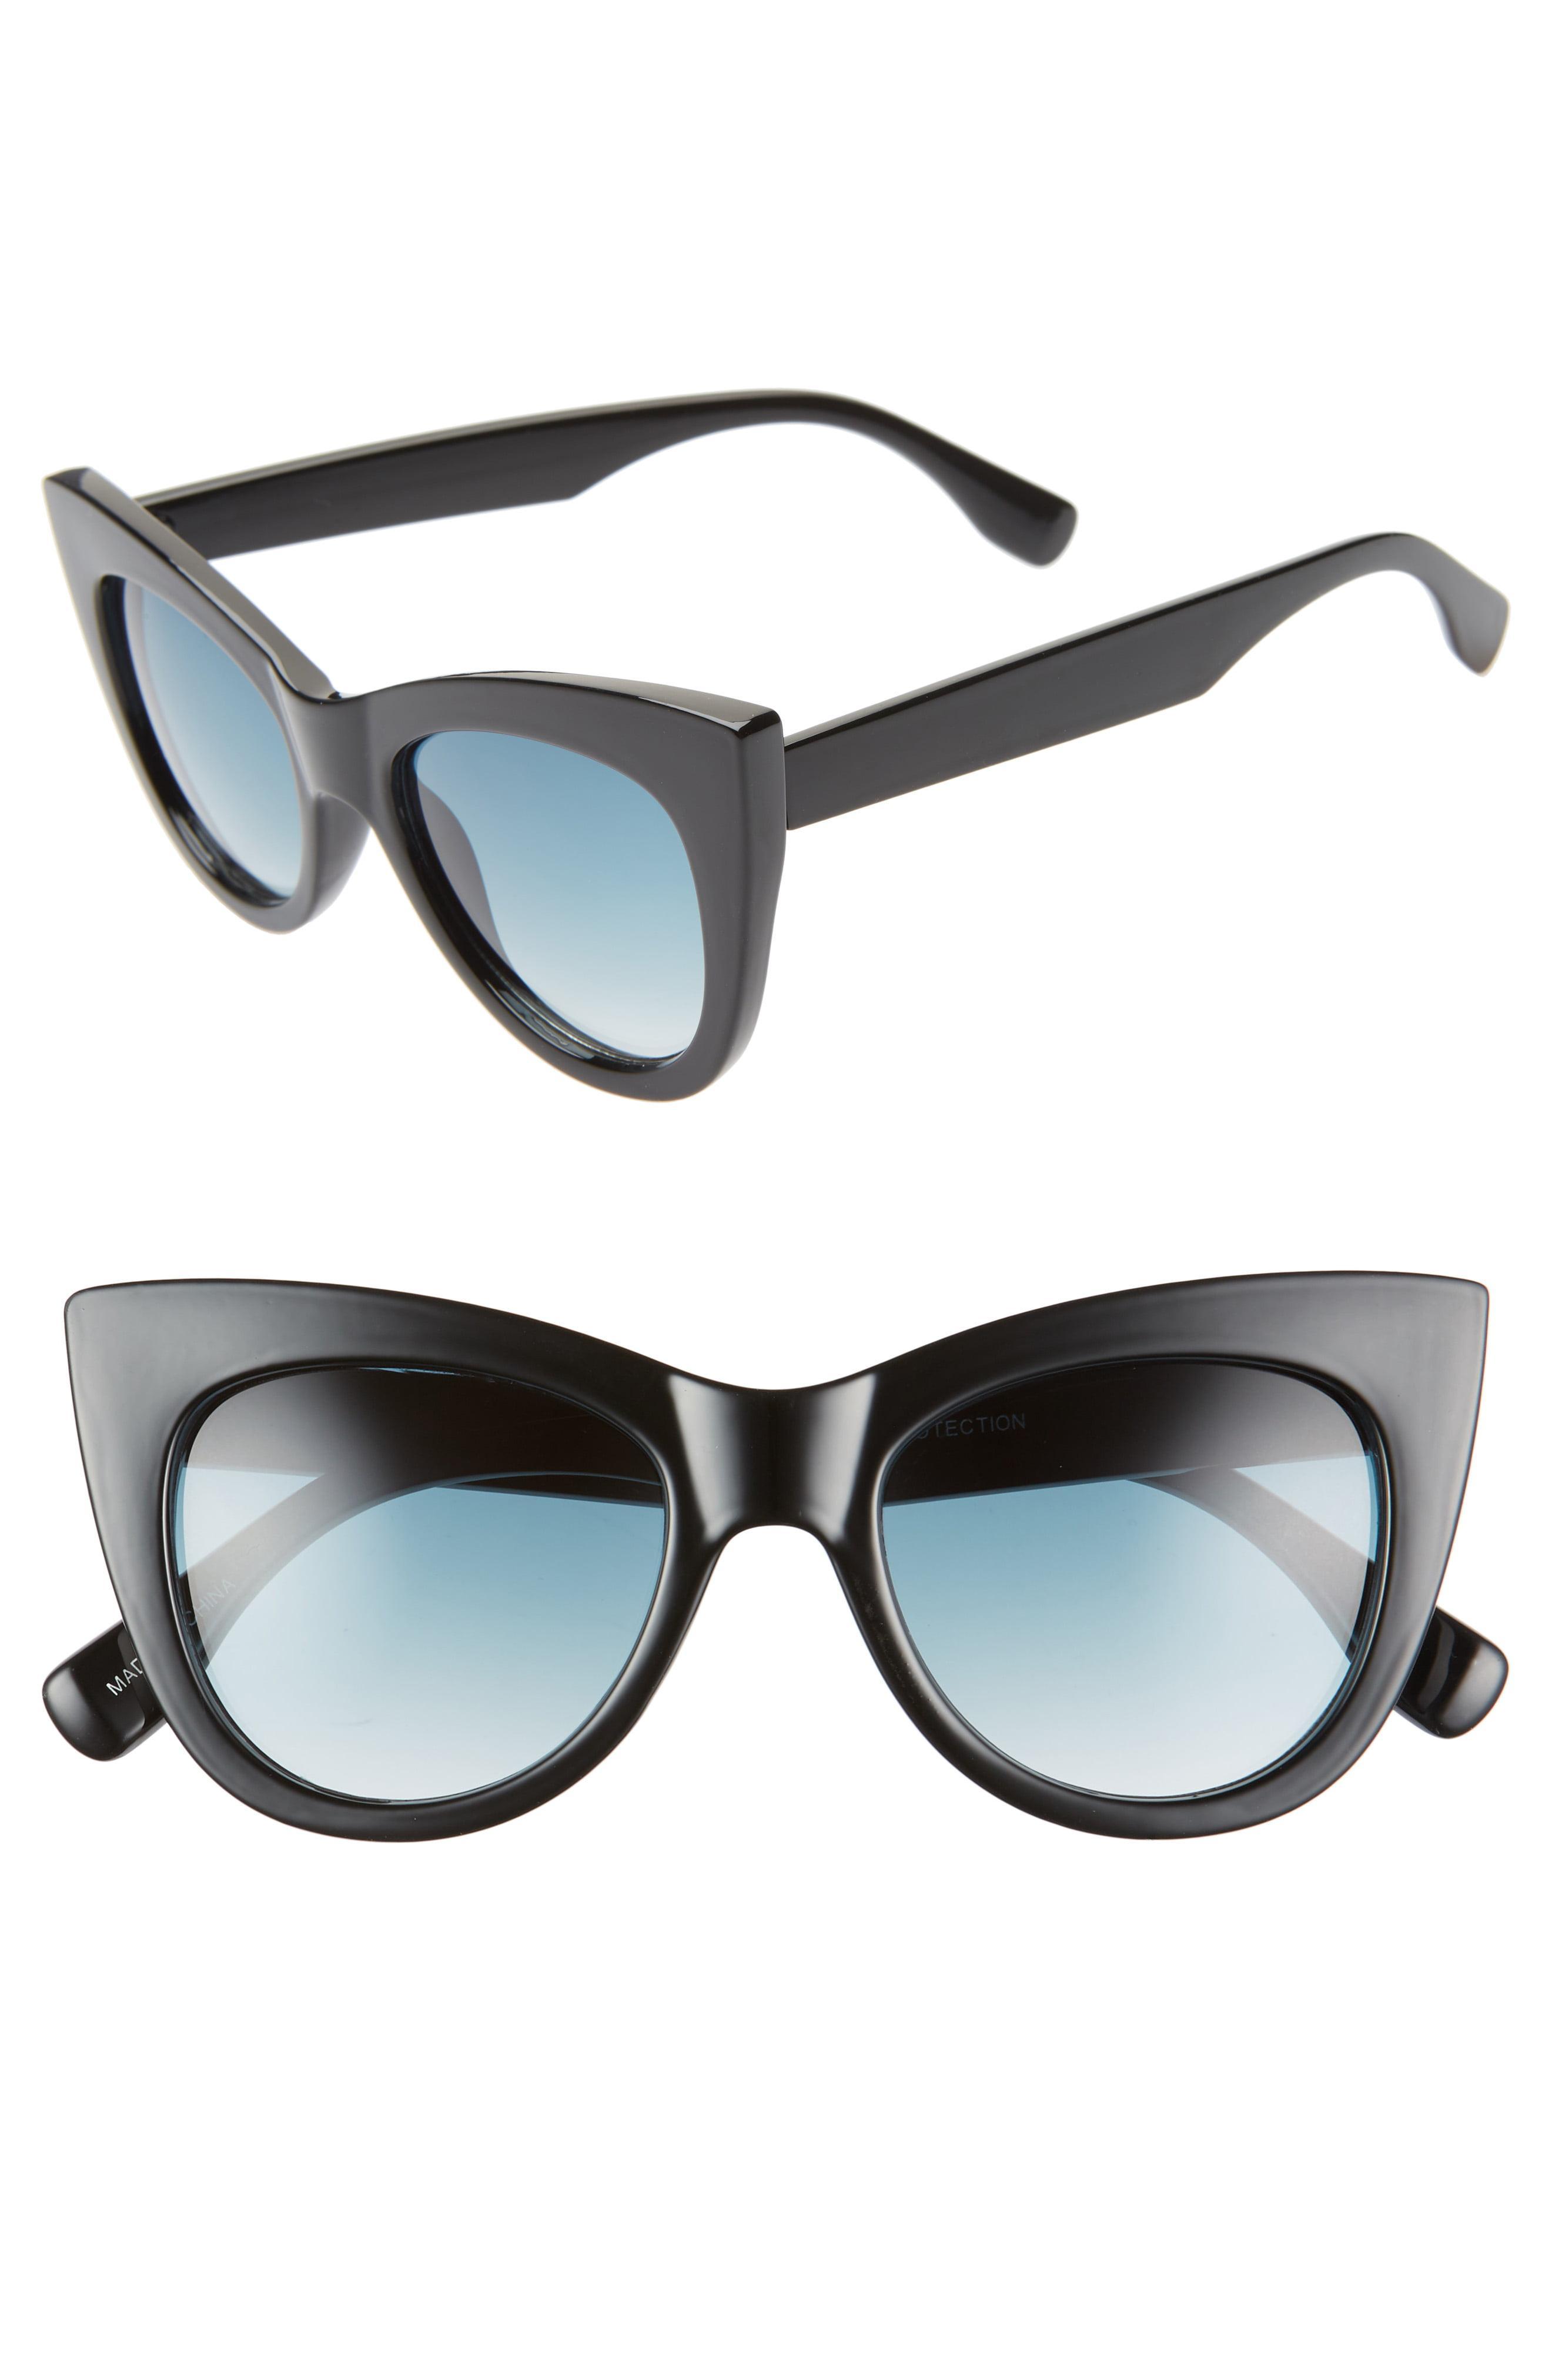 9868e10c9ac45 Lyst - BP. 50mm Gradient Cat Eye Sunglasses - in Blue